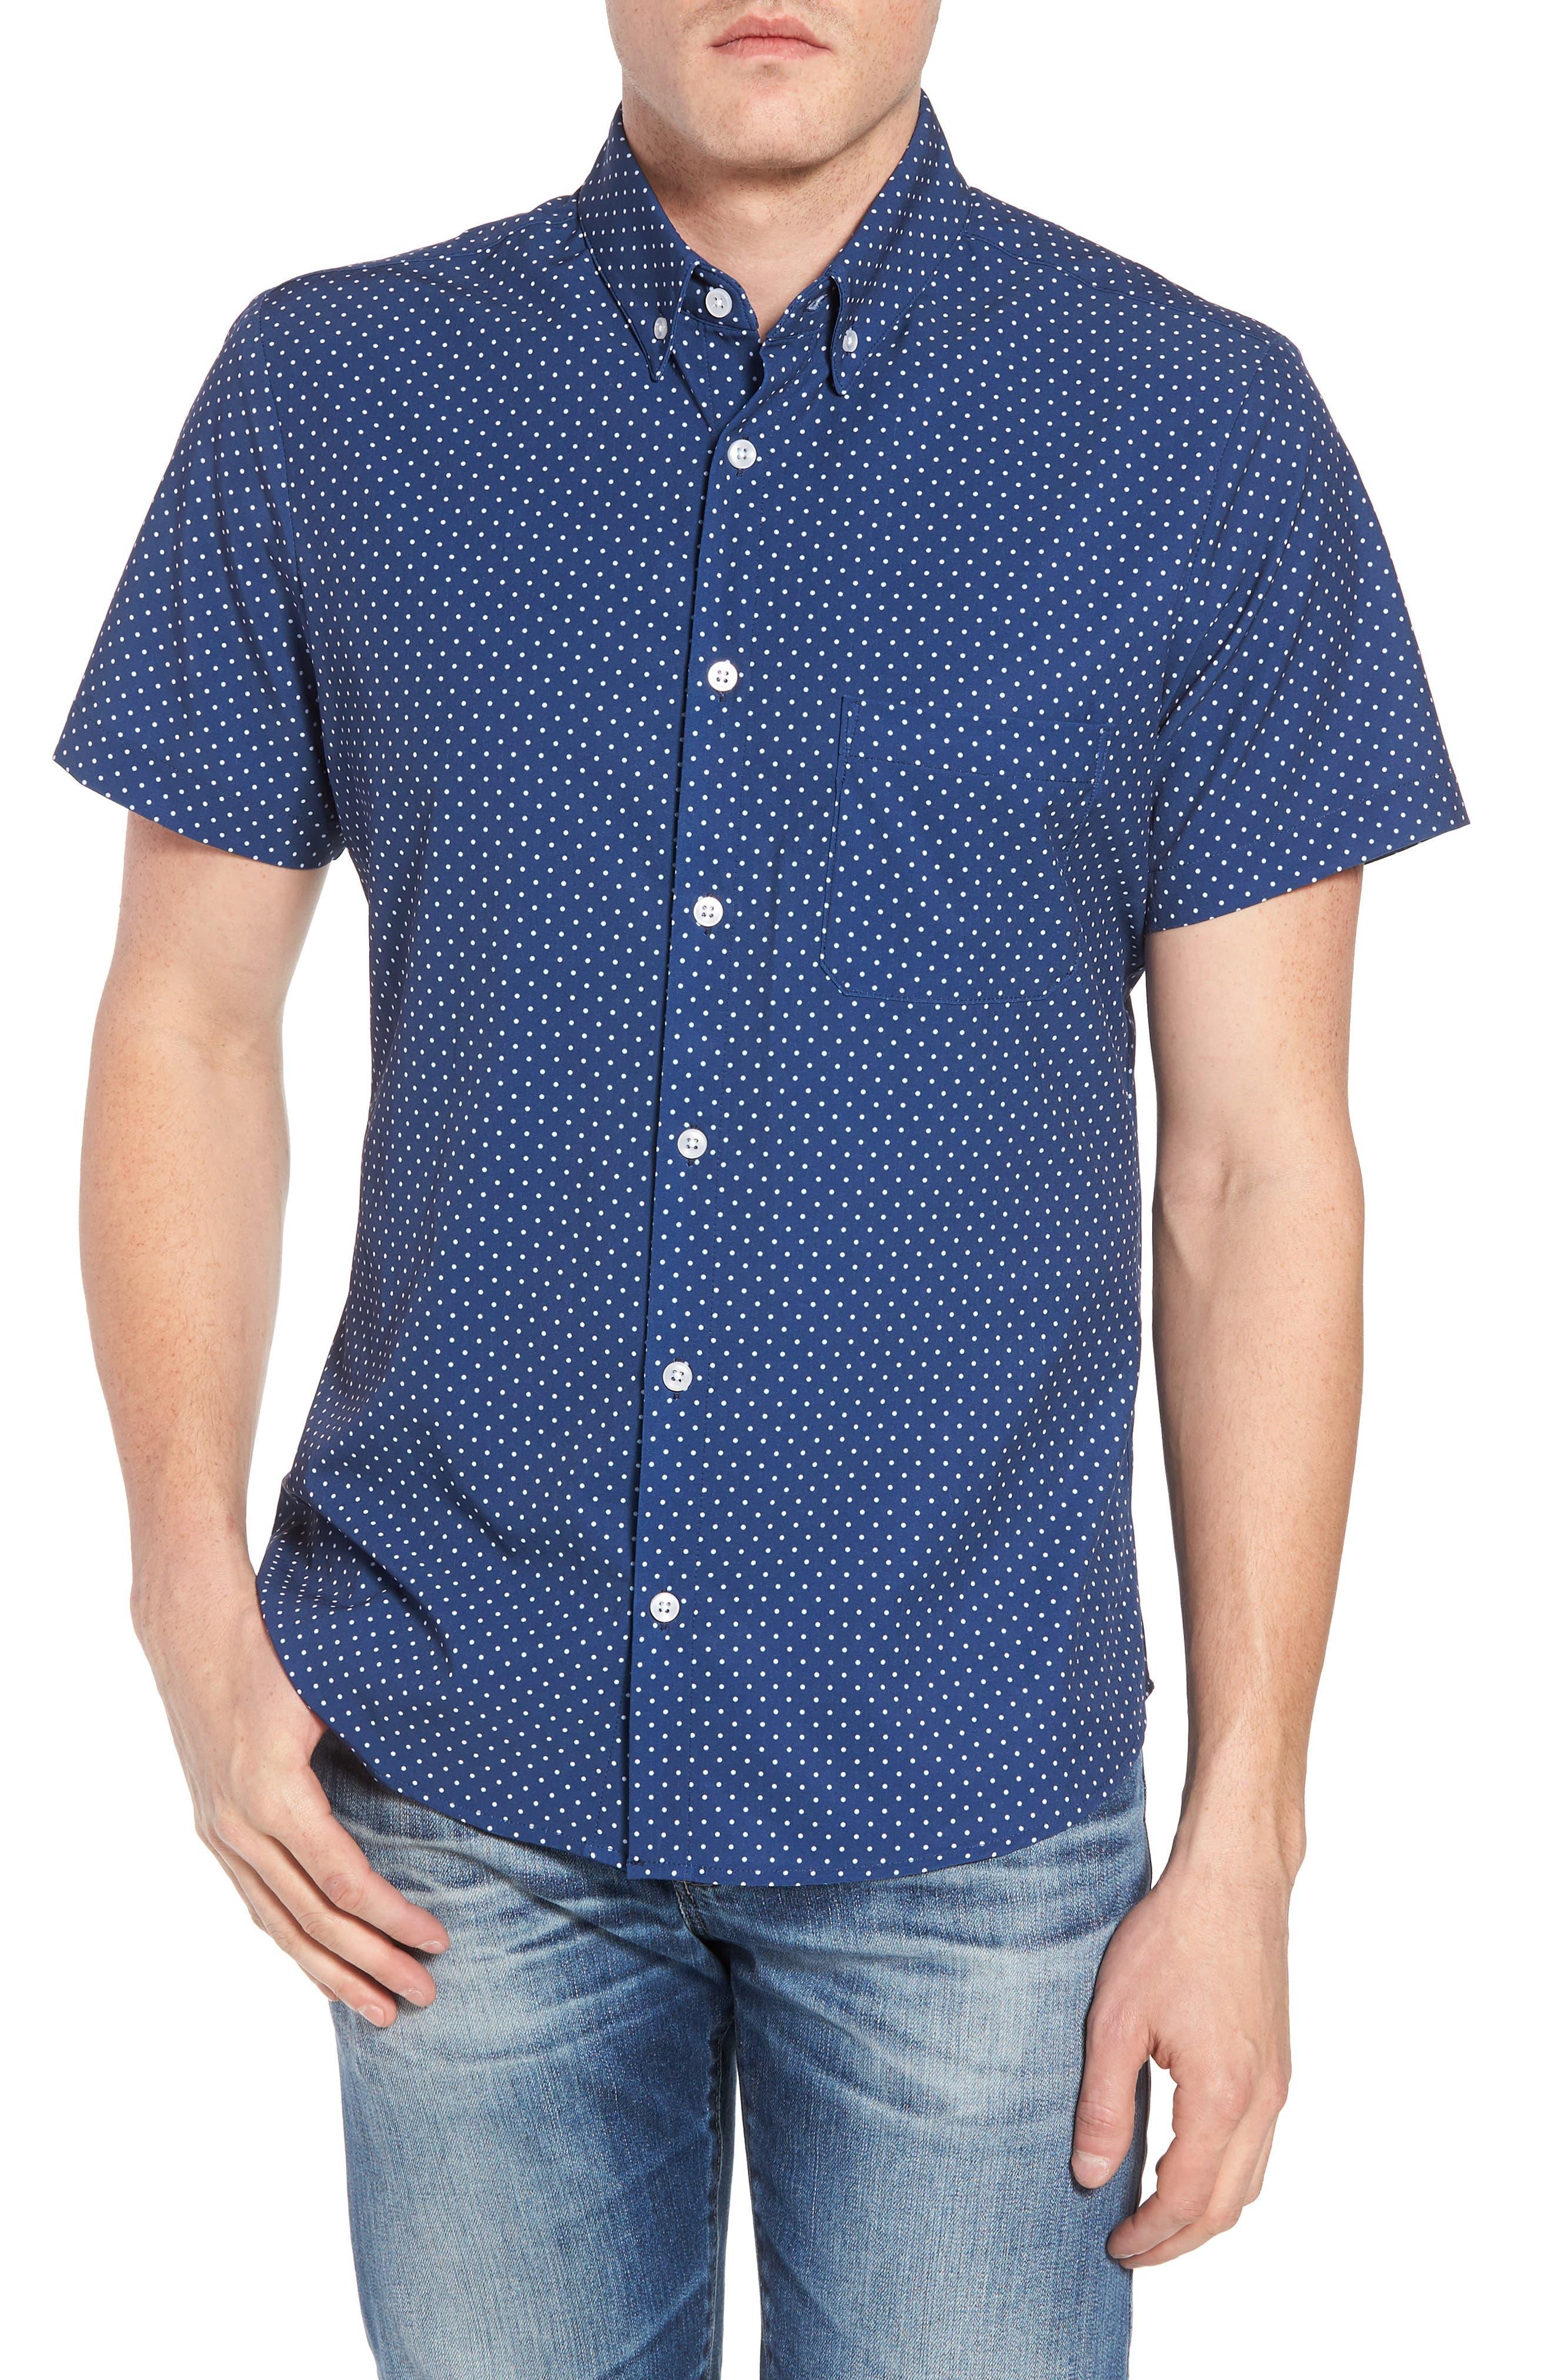 Crosby Slim Fit Dot Performance Sport Shirt,                             Main thumbnail 1, color,                             Navy